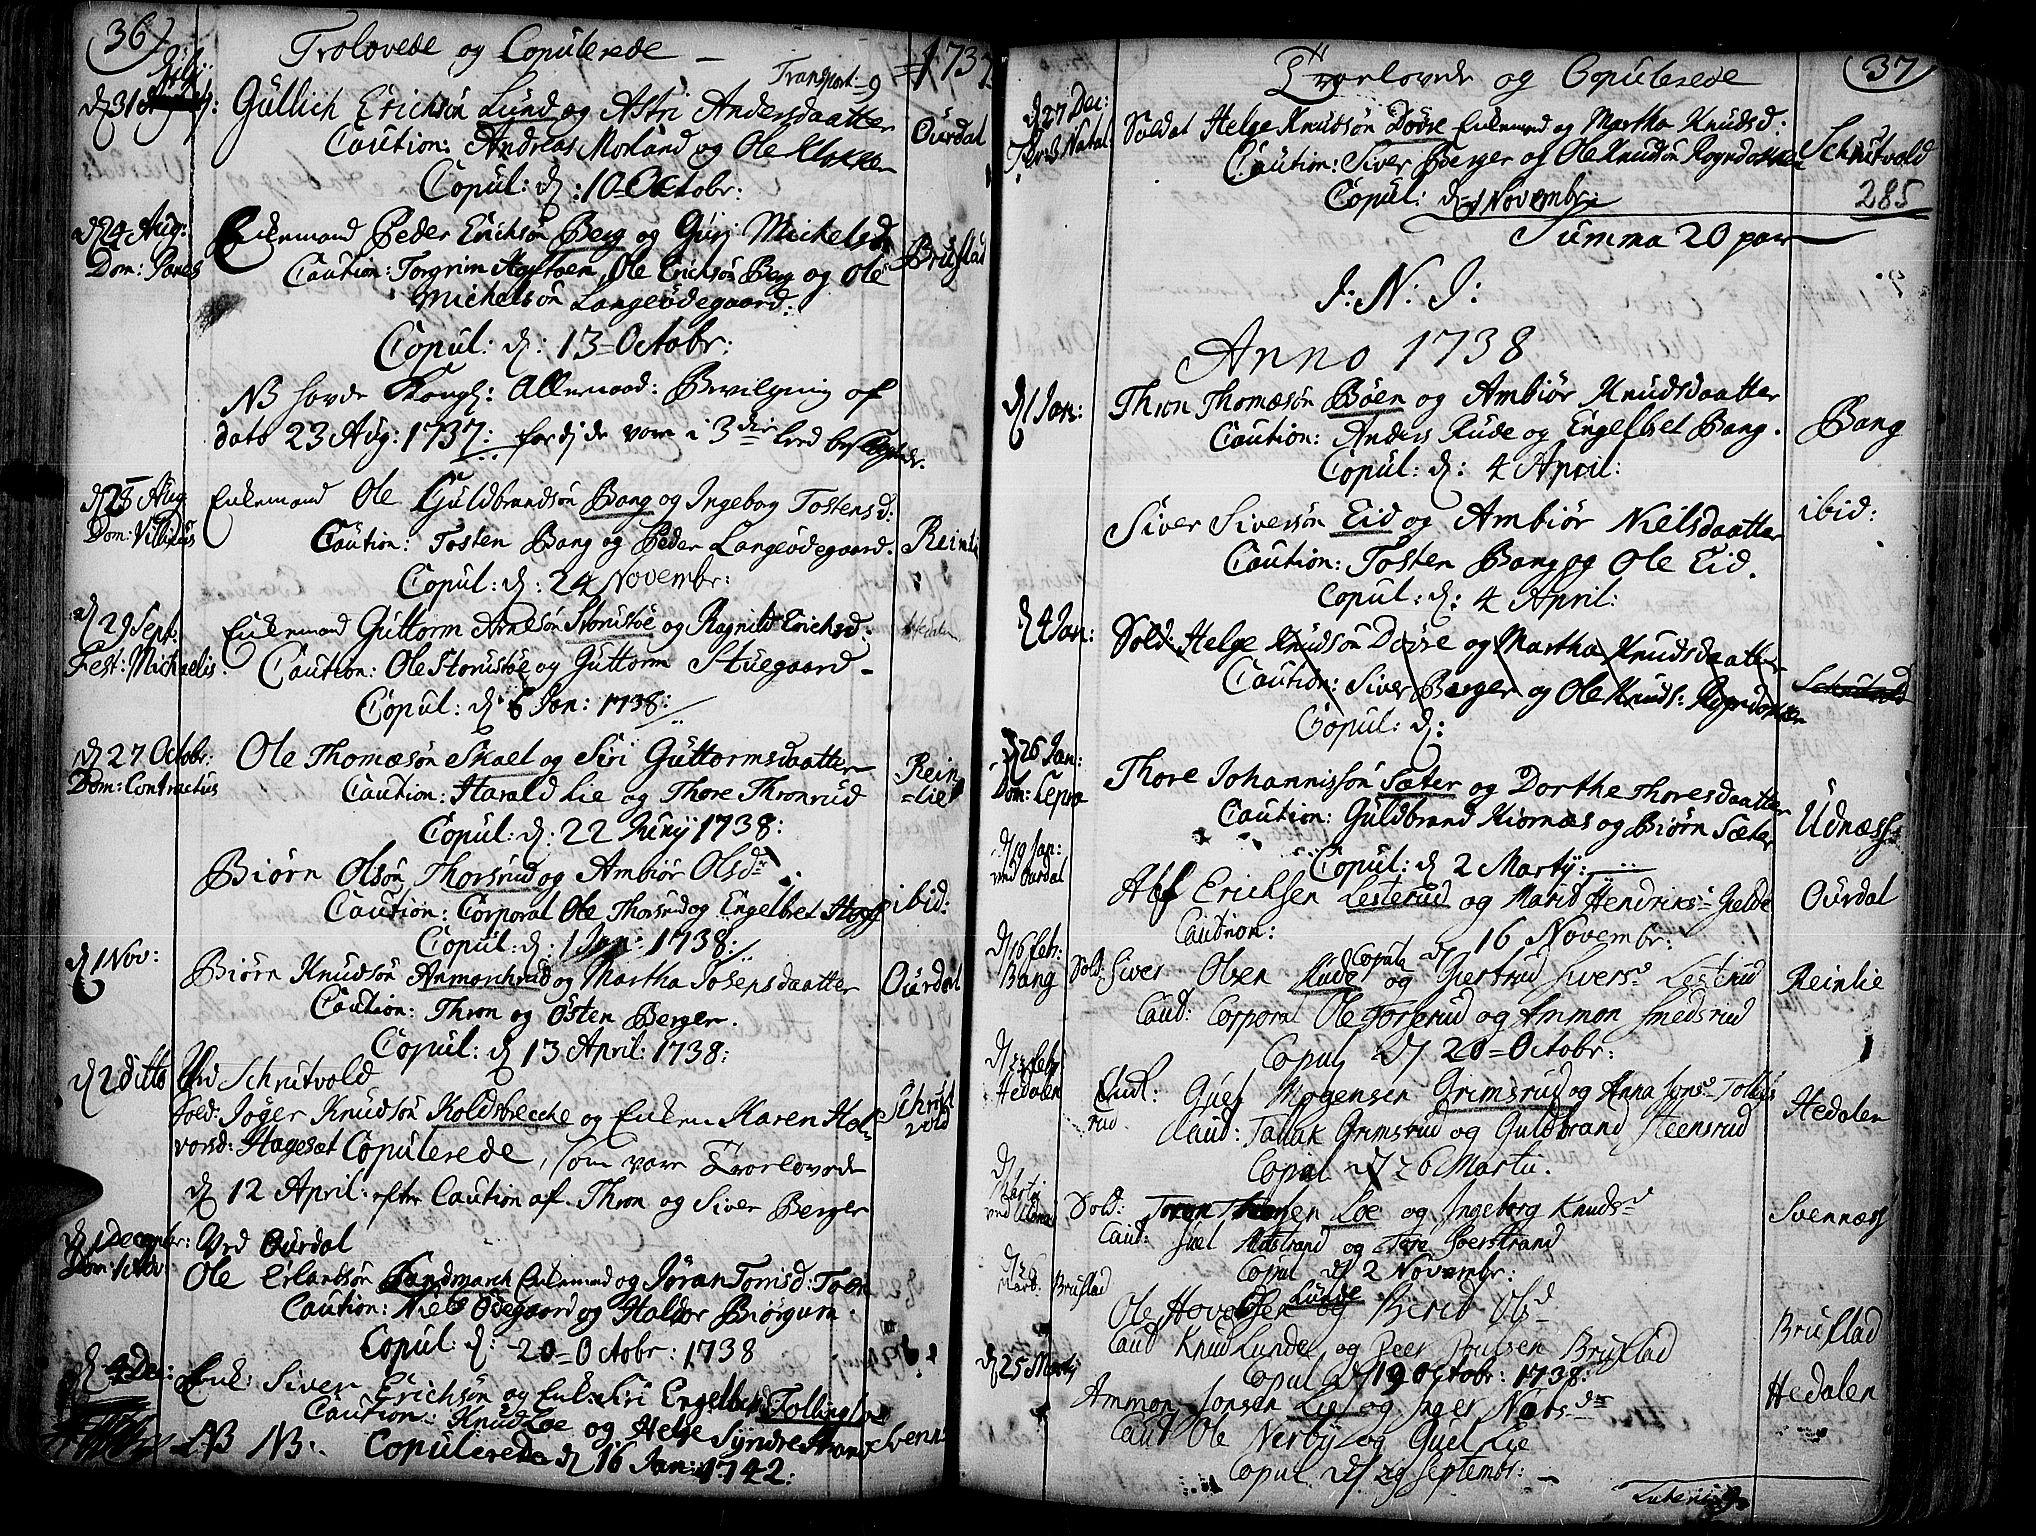 SAH, Aurdal prestekontor, Ministerialbok nr. 4, 1730-1762, s. 36-37